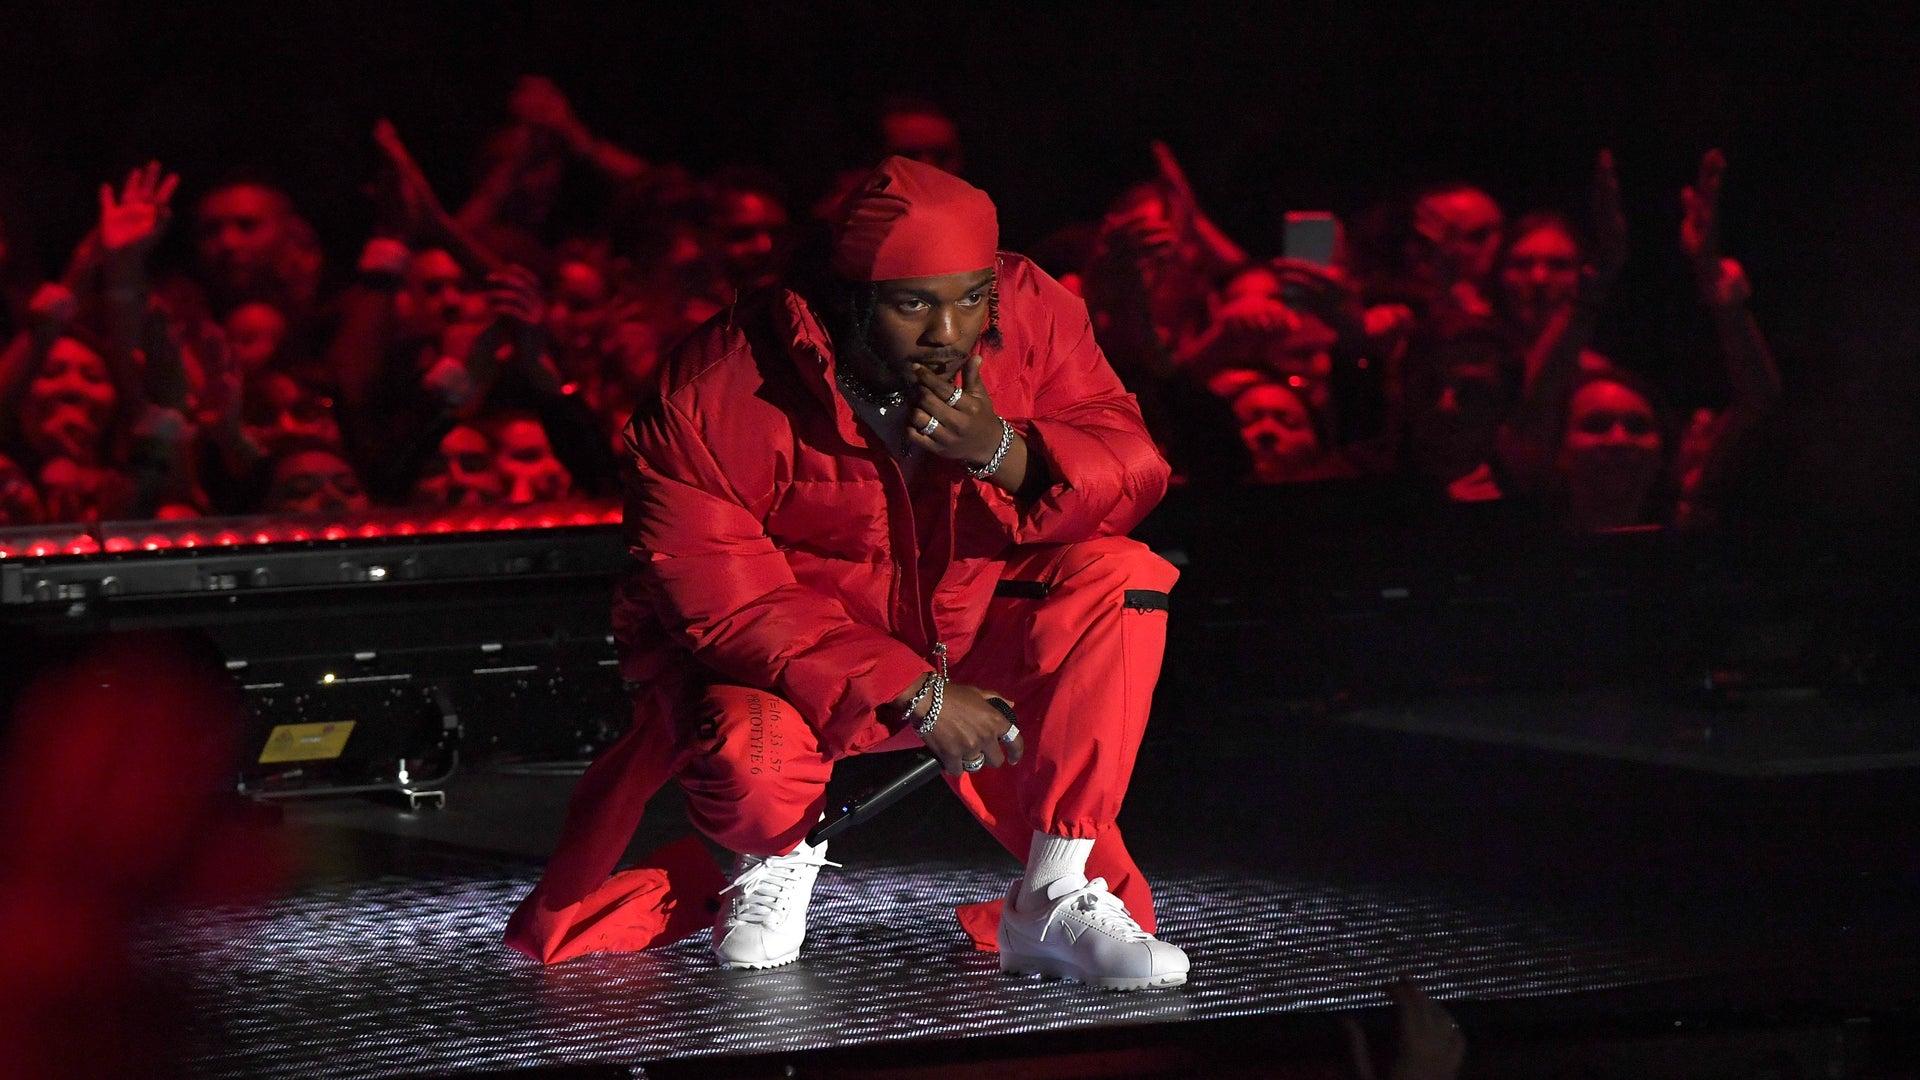 Kendrick Lamar Wins Video Of The Year At The 2017 MTV VMAs